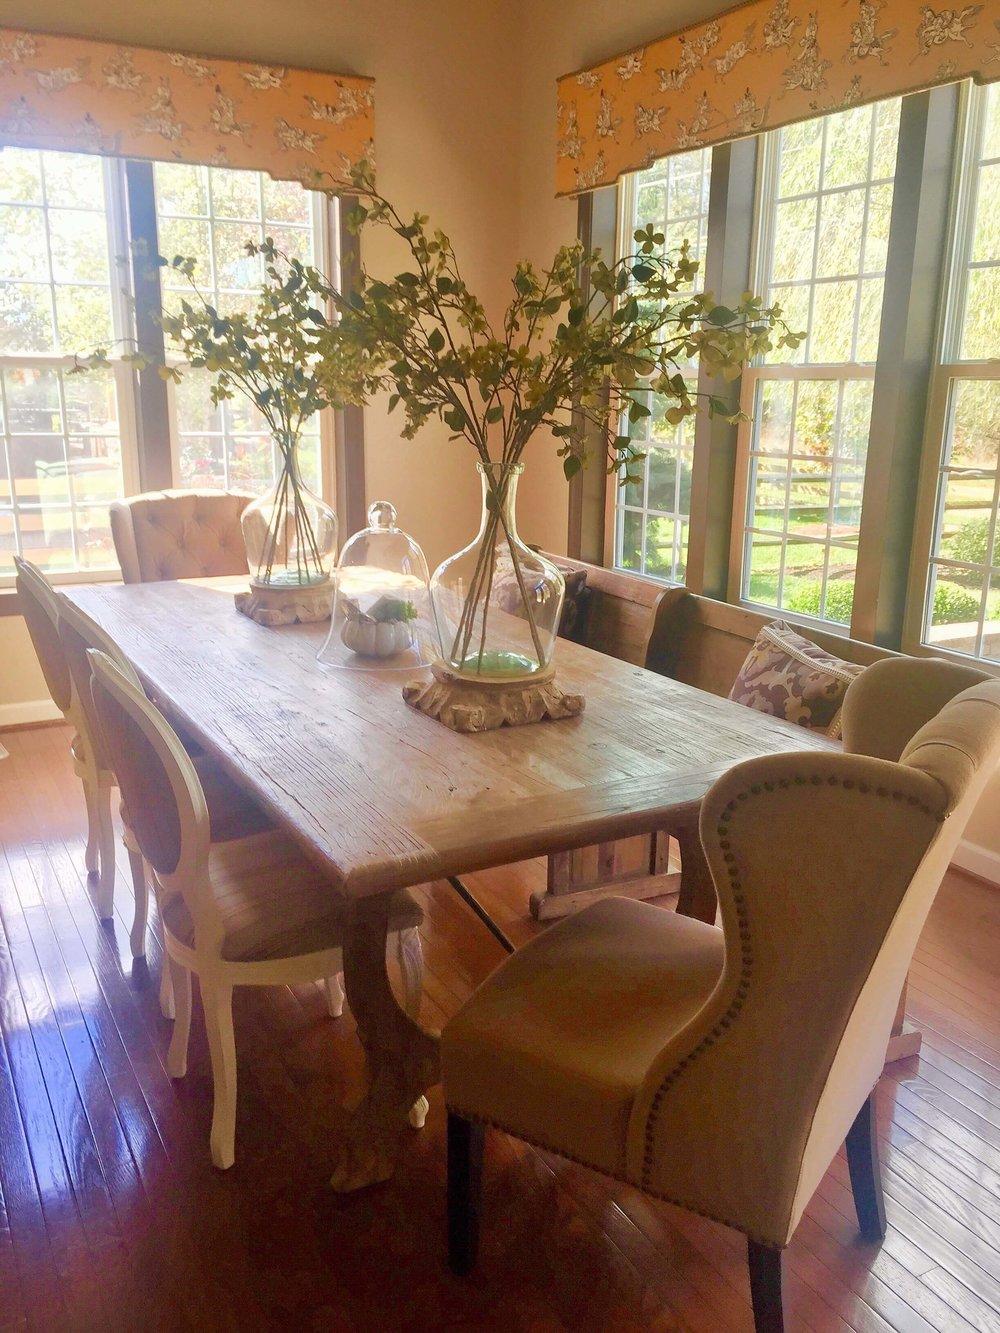 kitchen-interior-design-remodel-renovate-virginia-3.jpg